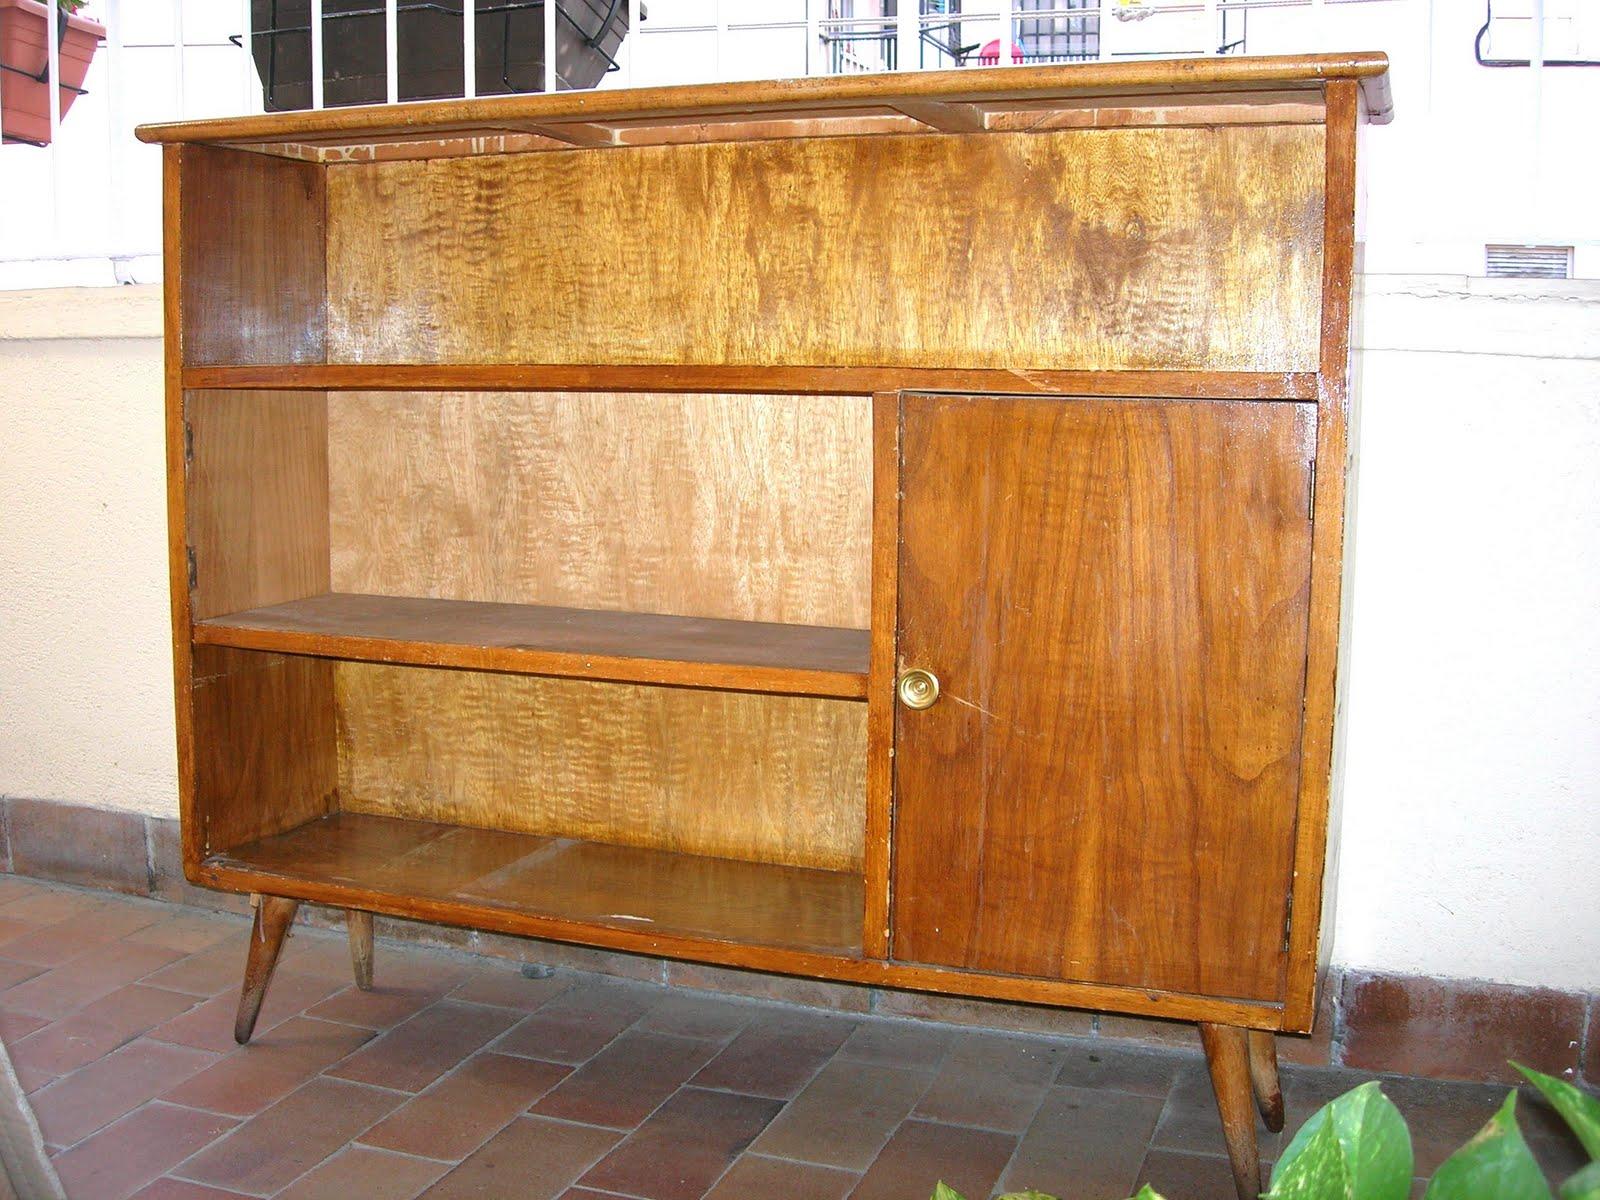 Naifandtastic decoraci n craft hecho a mano - Restauracion de muebles de madera ...